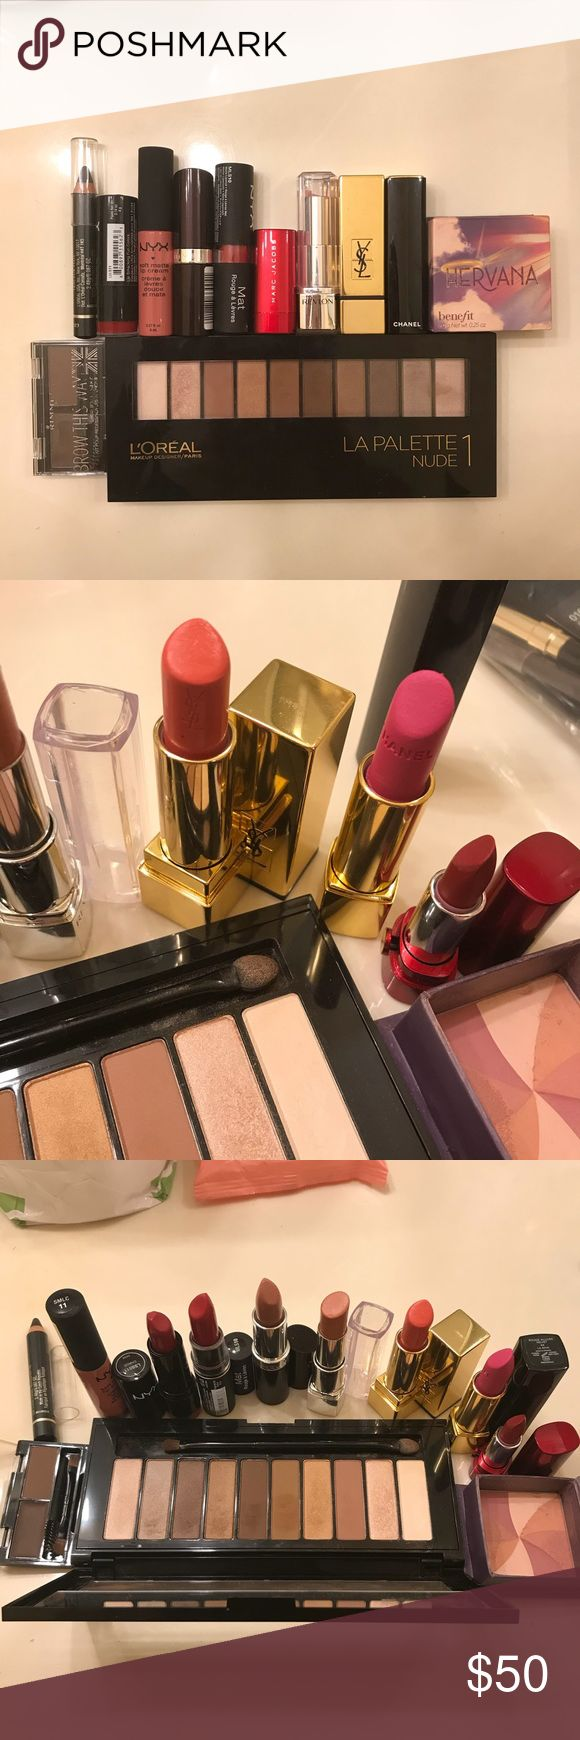 A Bag of makeup products YSL Rouge Lipstick- 36 Chanel Rouge Allure Velvet lipstick- 44 La Diva Marc Jacobs lipstick- 240 so Rouge L'Oreal La Palette - nude1 RIMMEL eyebrow kit - 002 Medium Brown L'Oreal eyeliner - Grey / Gris Benifit Blush - Hervana NYX soft matte lip cream - SMLc11 NYX lipstick - LSS511 Chaos NYX Matte lipstick - MLS10 Perfect Red Rimmel lipstick - 070 Airy Fairy Revlon lipstick - 865 hd magnolia Makeup #redlipstick